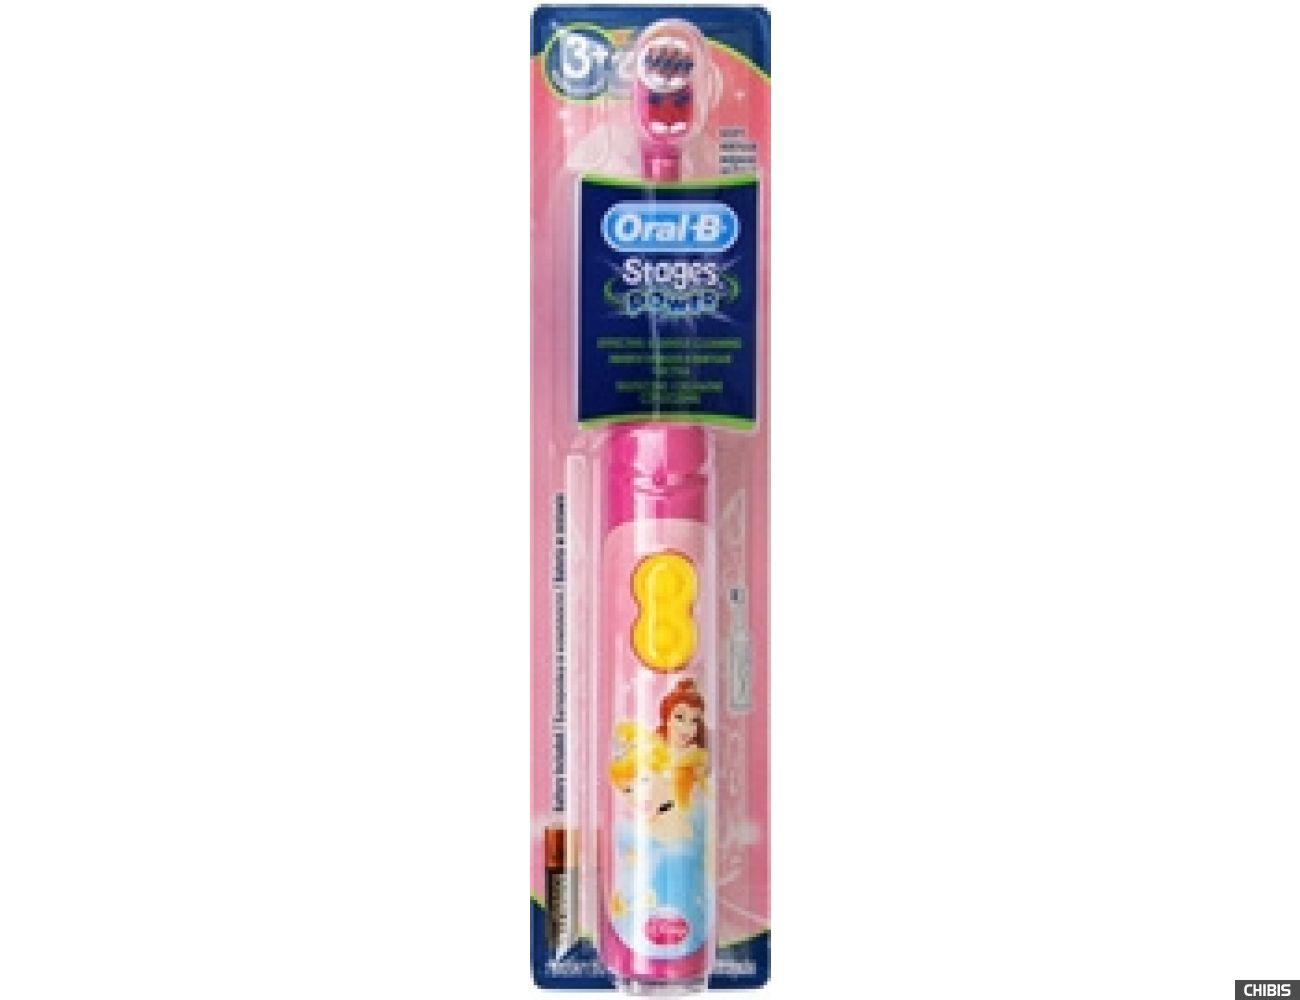 Электрическая зубная щетка Oral B Braun Stages Power принцесса (DB3010)